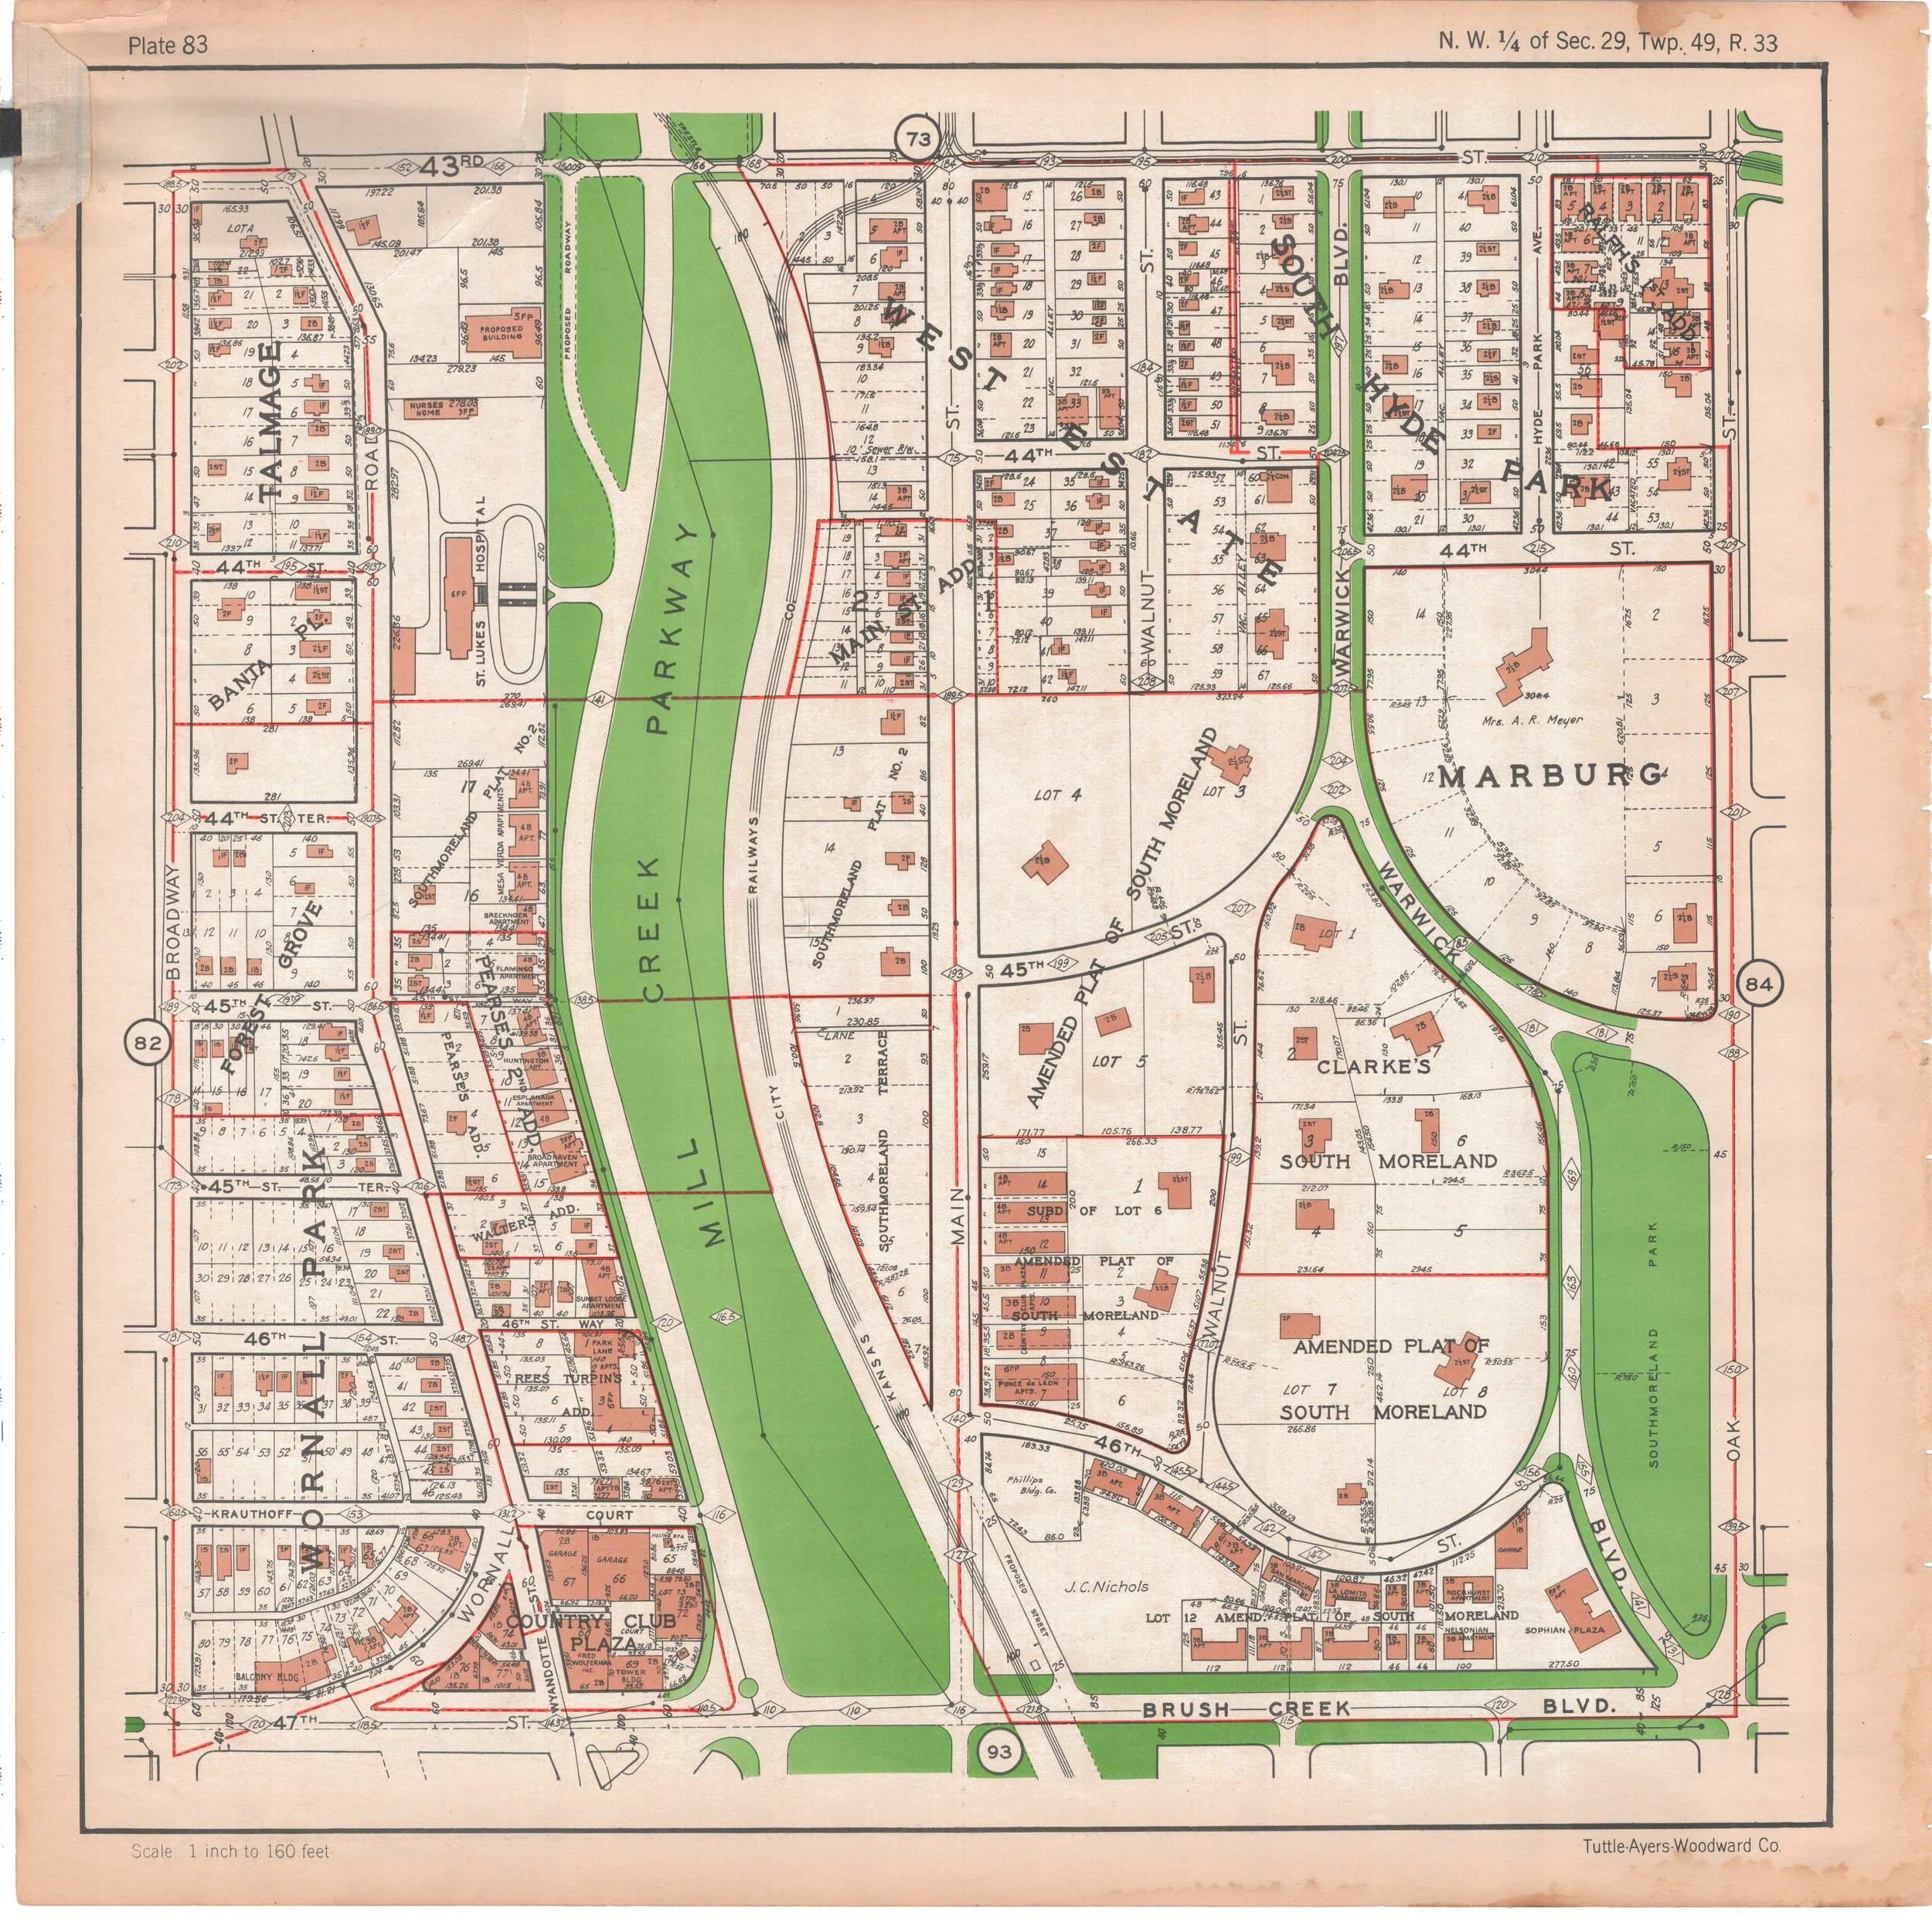 1925 TUTTLE_AYERS_Plate 83.JPG